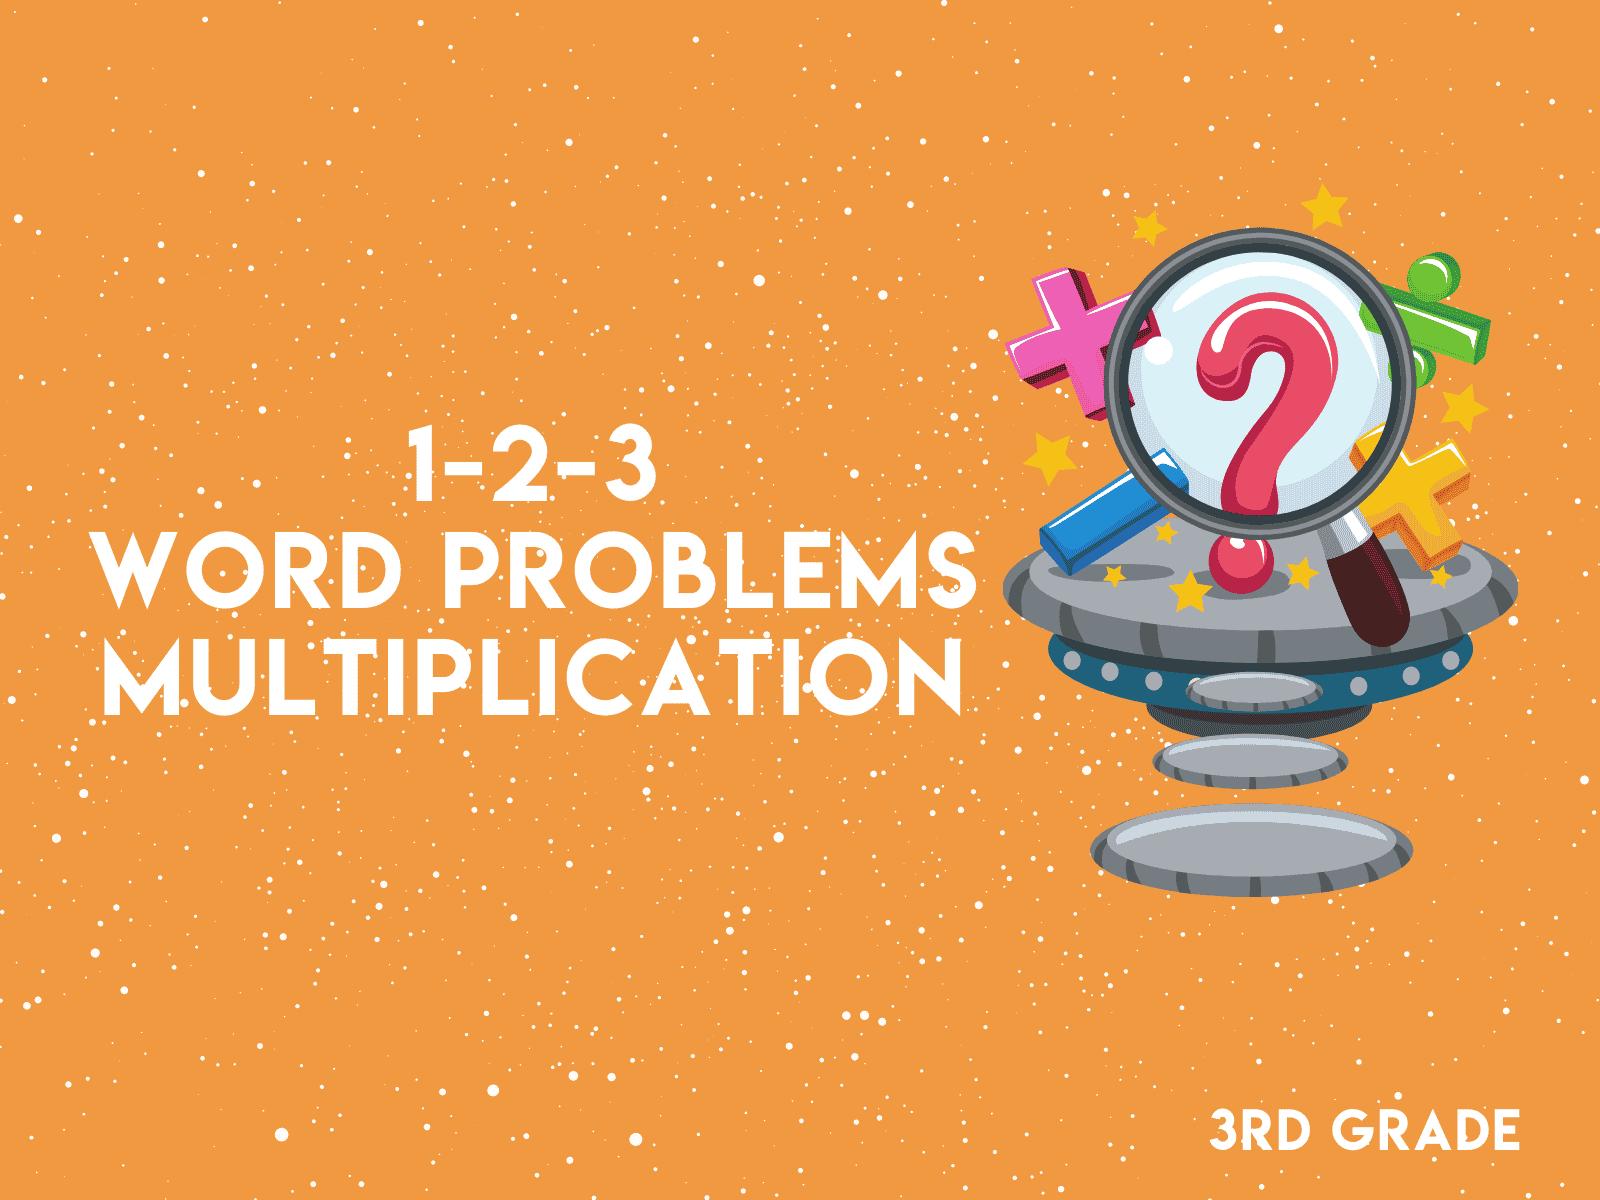 3rd Grade - 123 Word Problems